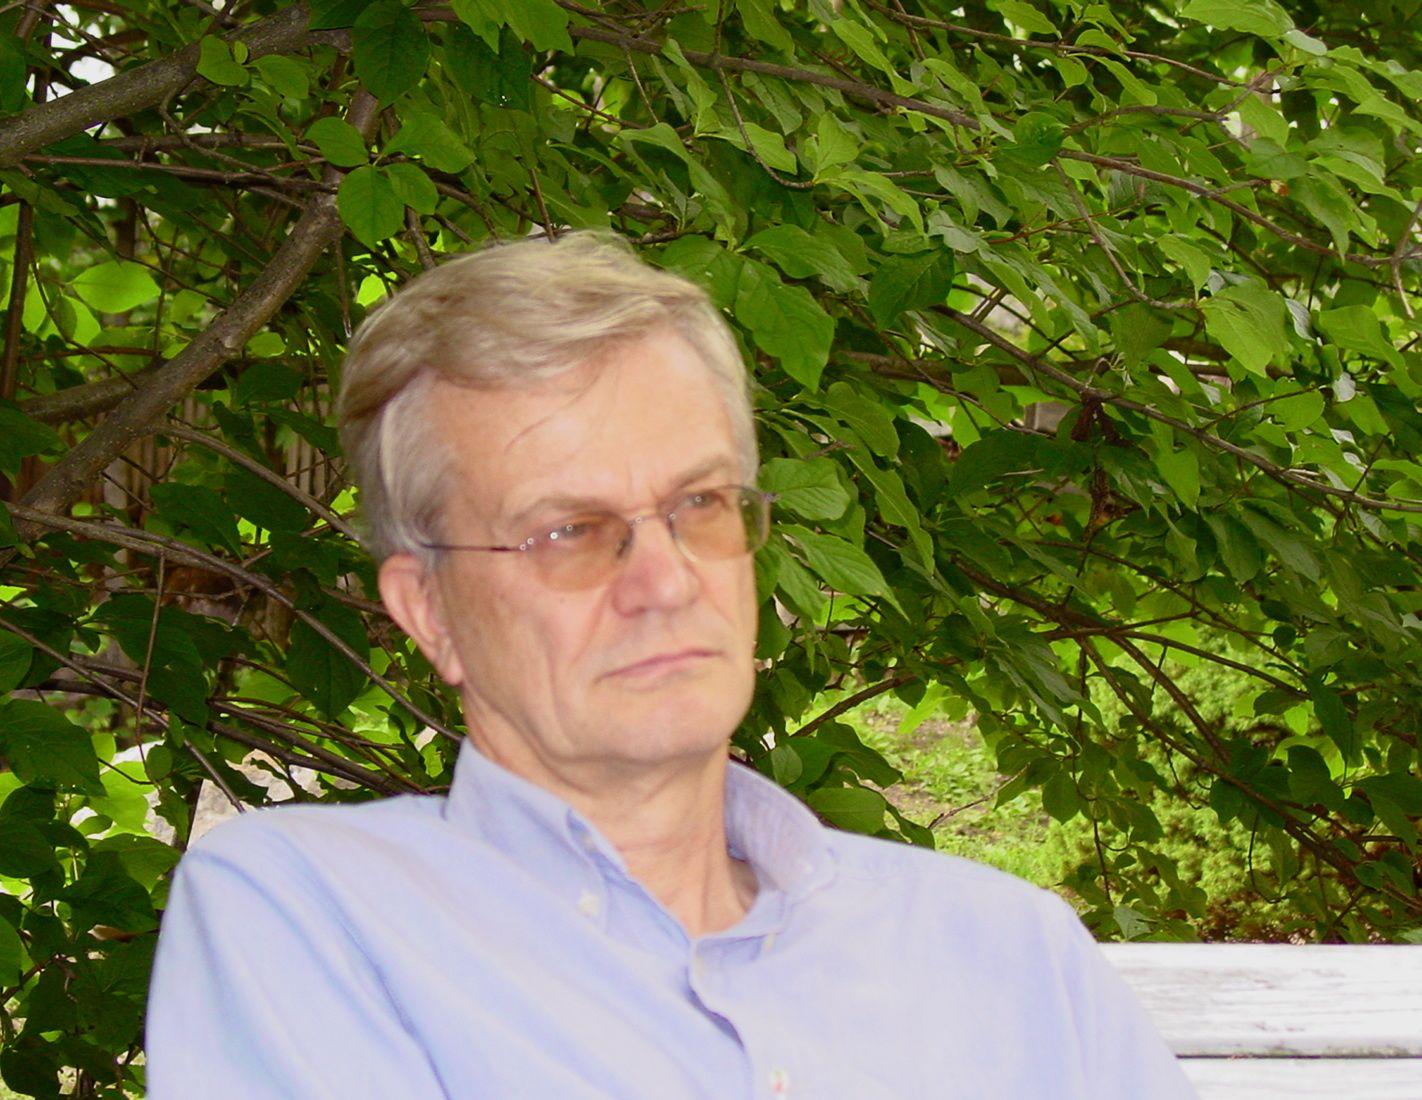 Professor emeritus Jan Otto Andersson